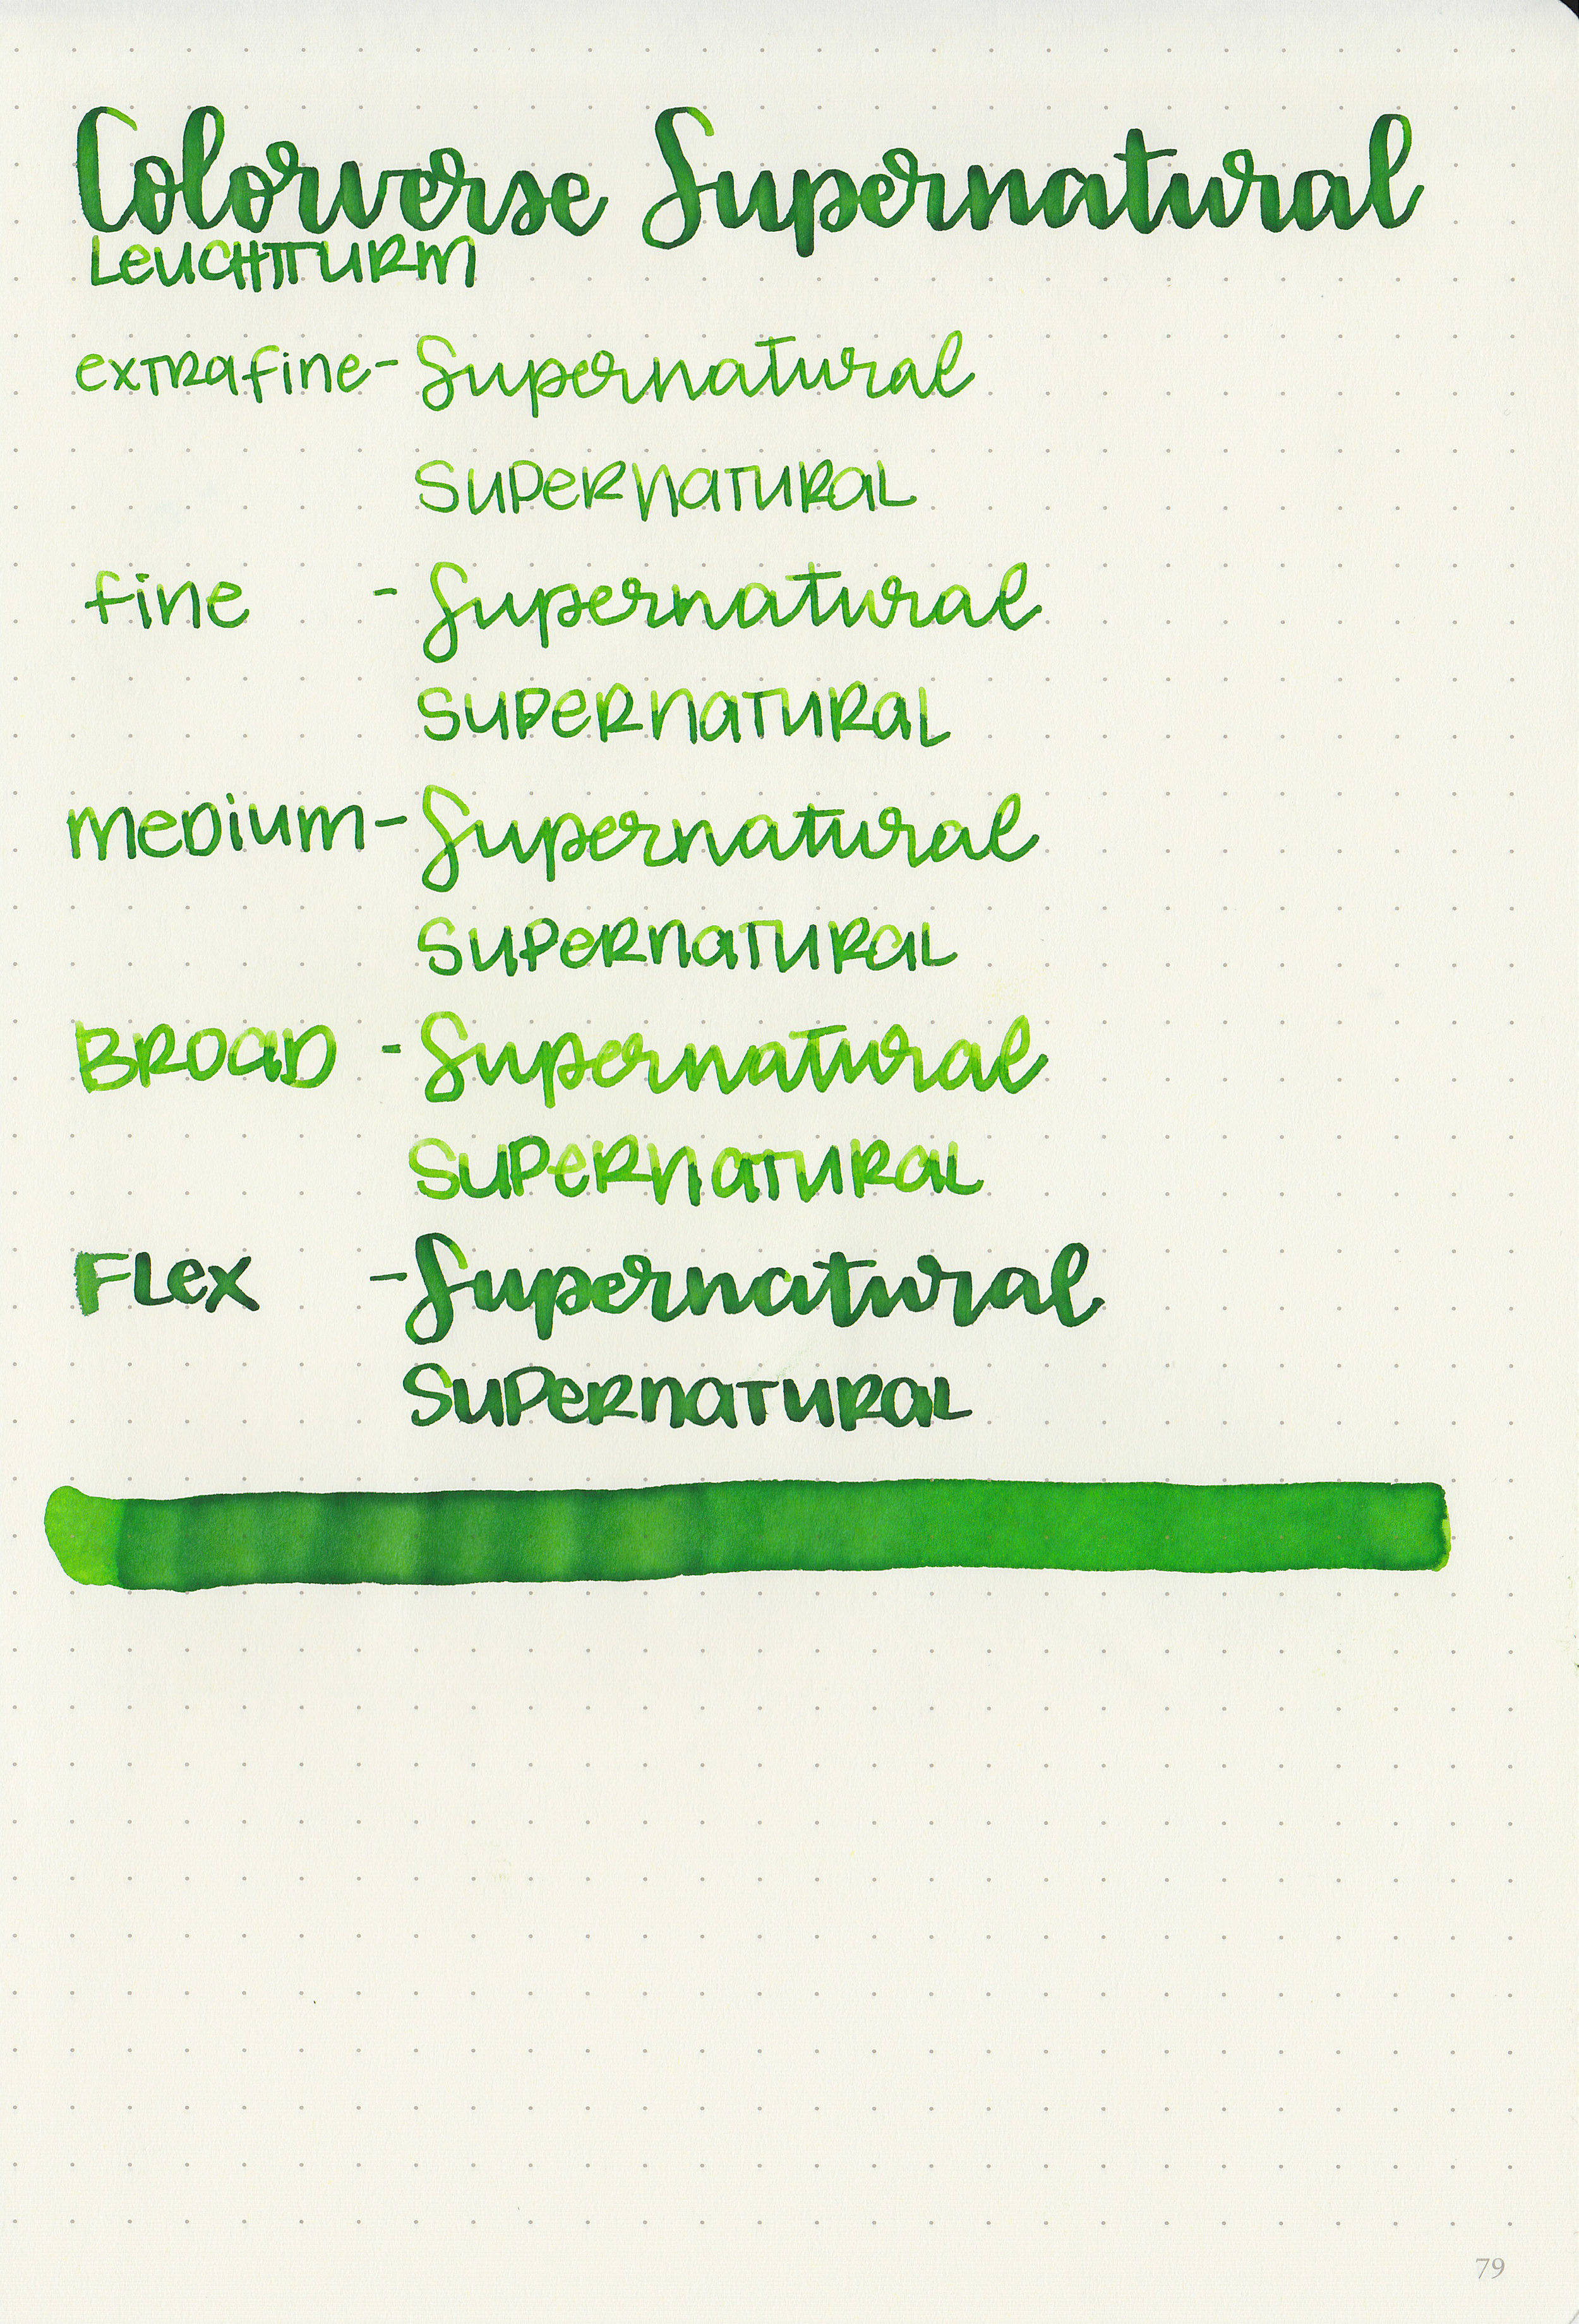 cv-supernatural-9.jpg